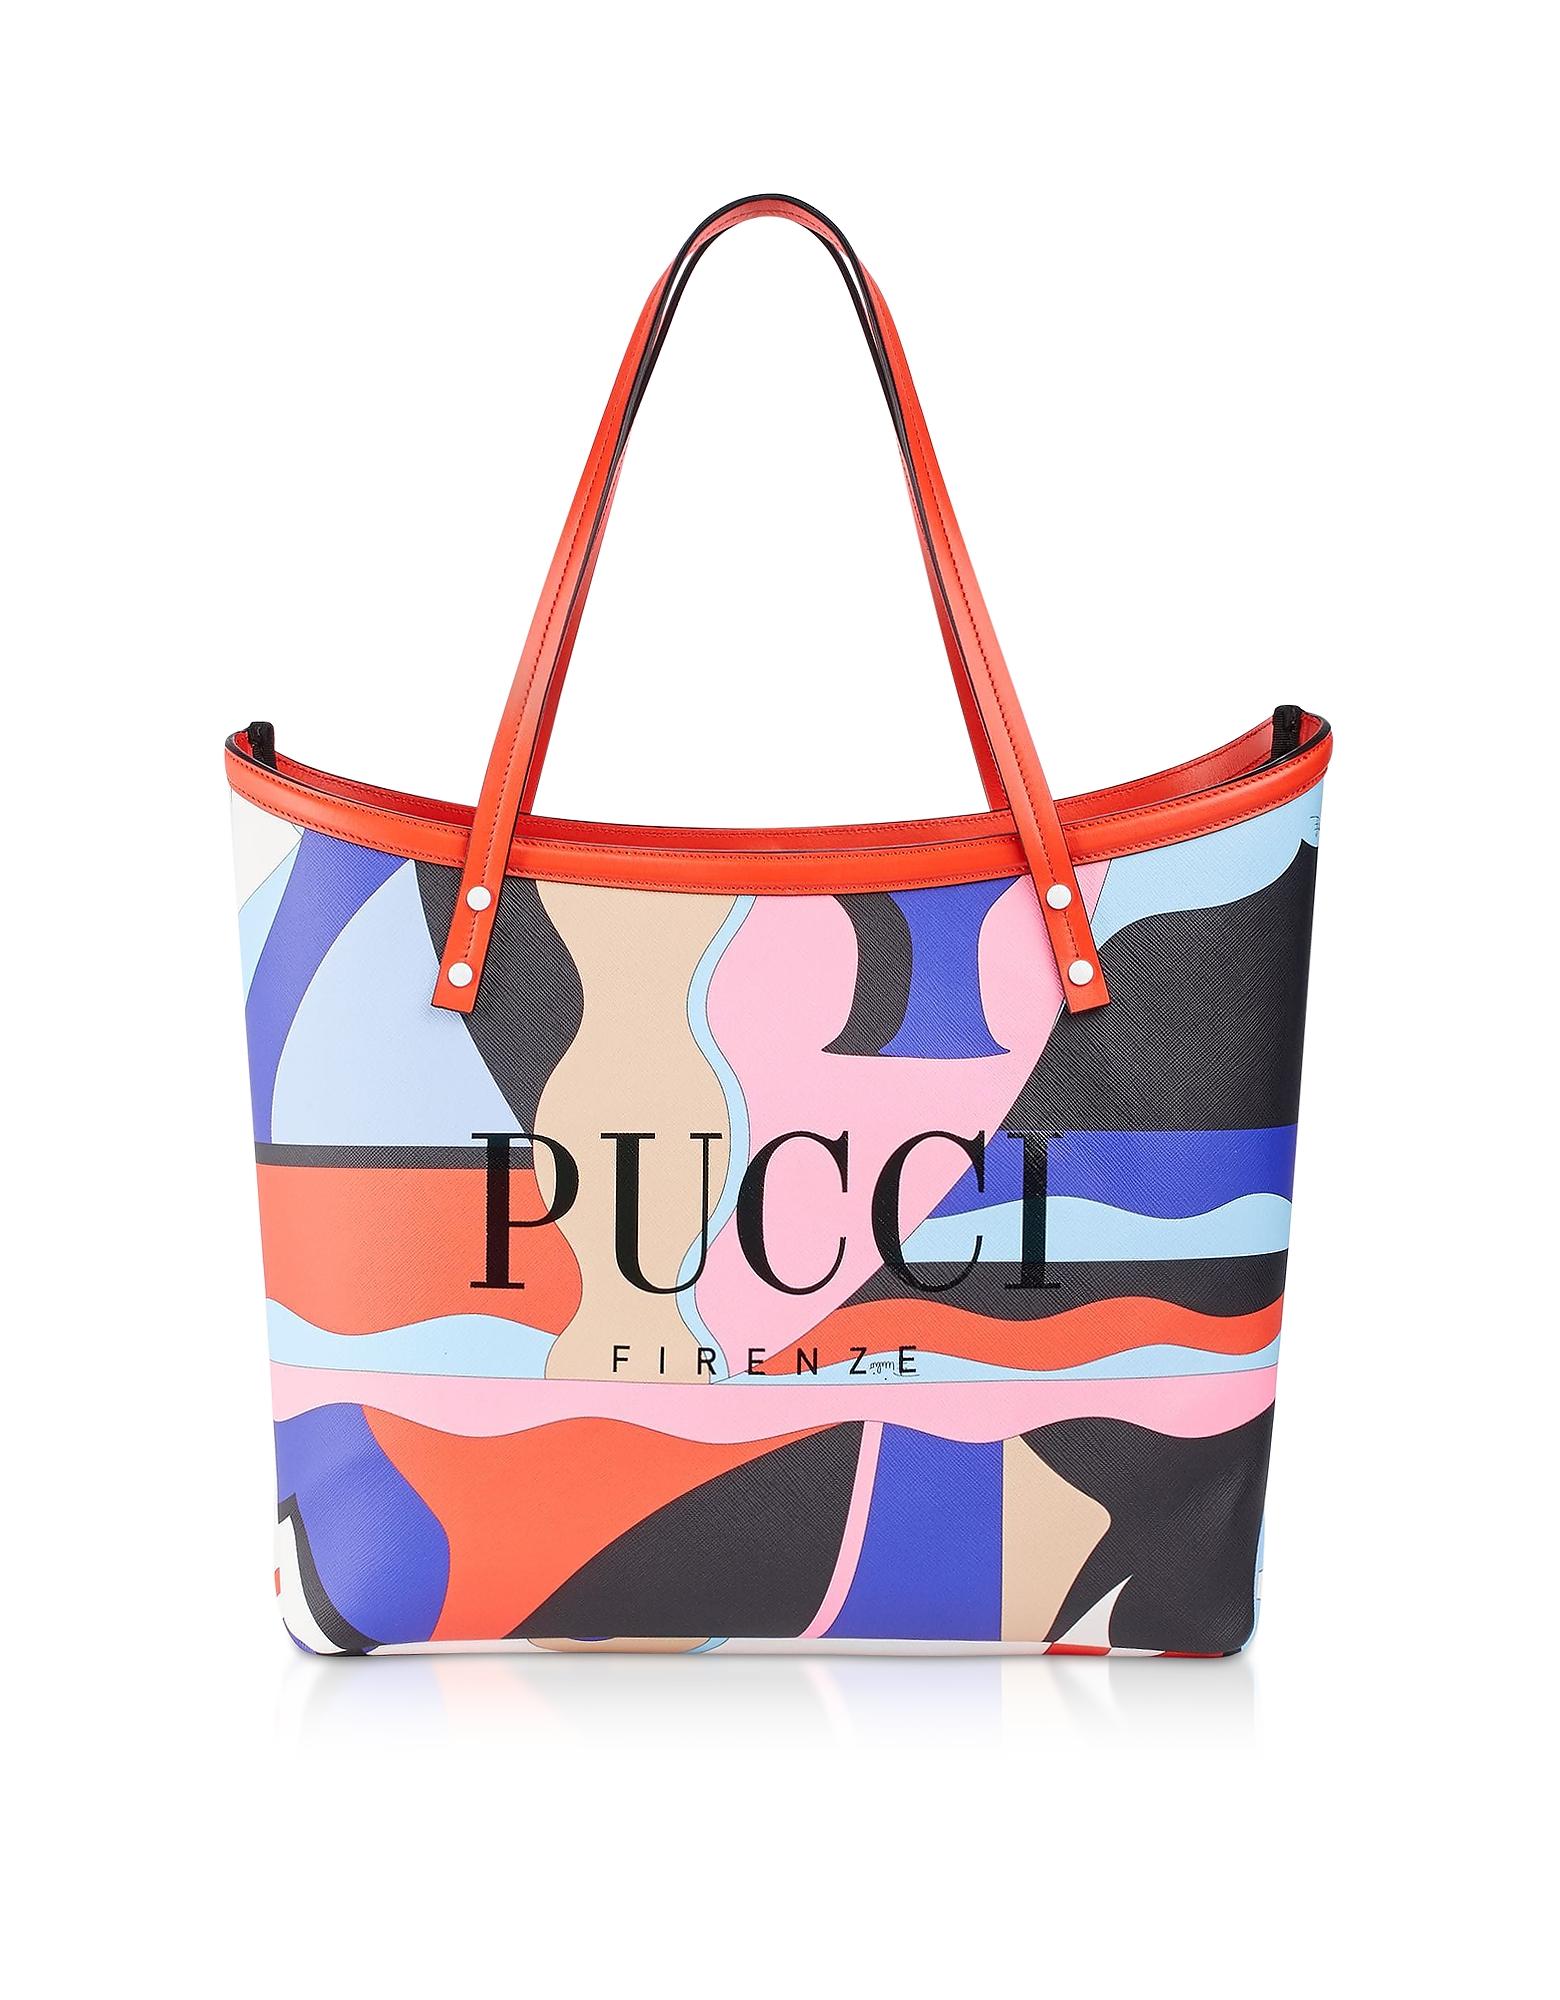 Emilio Pucci Designer Handbags, Two Tone Canvas Large Tote Bag